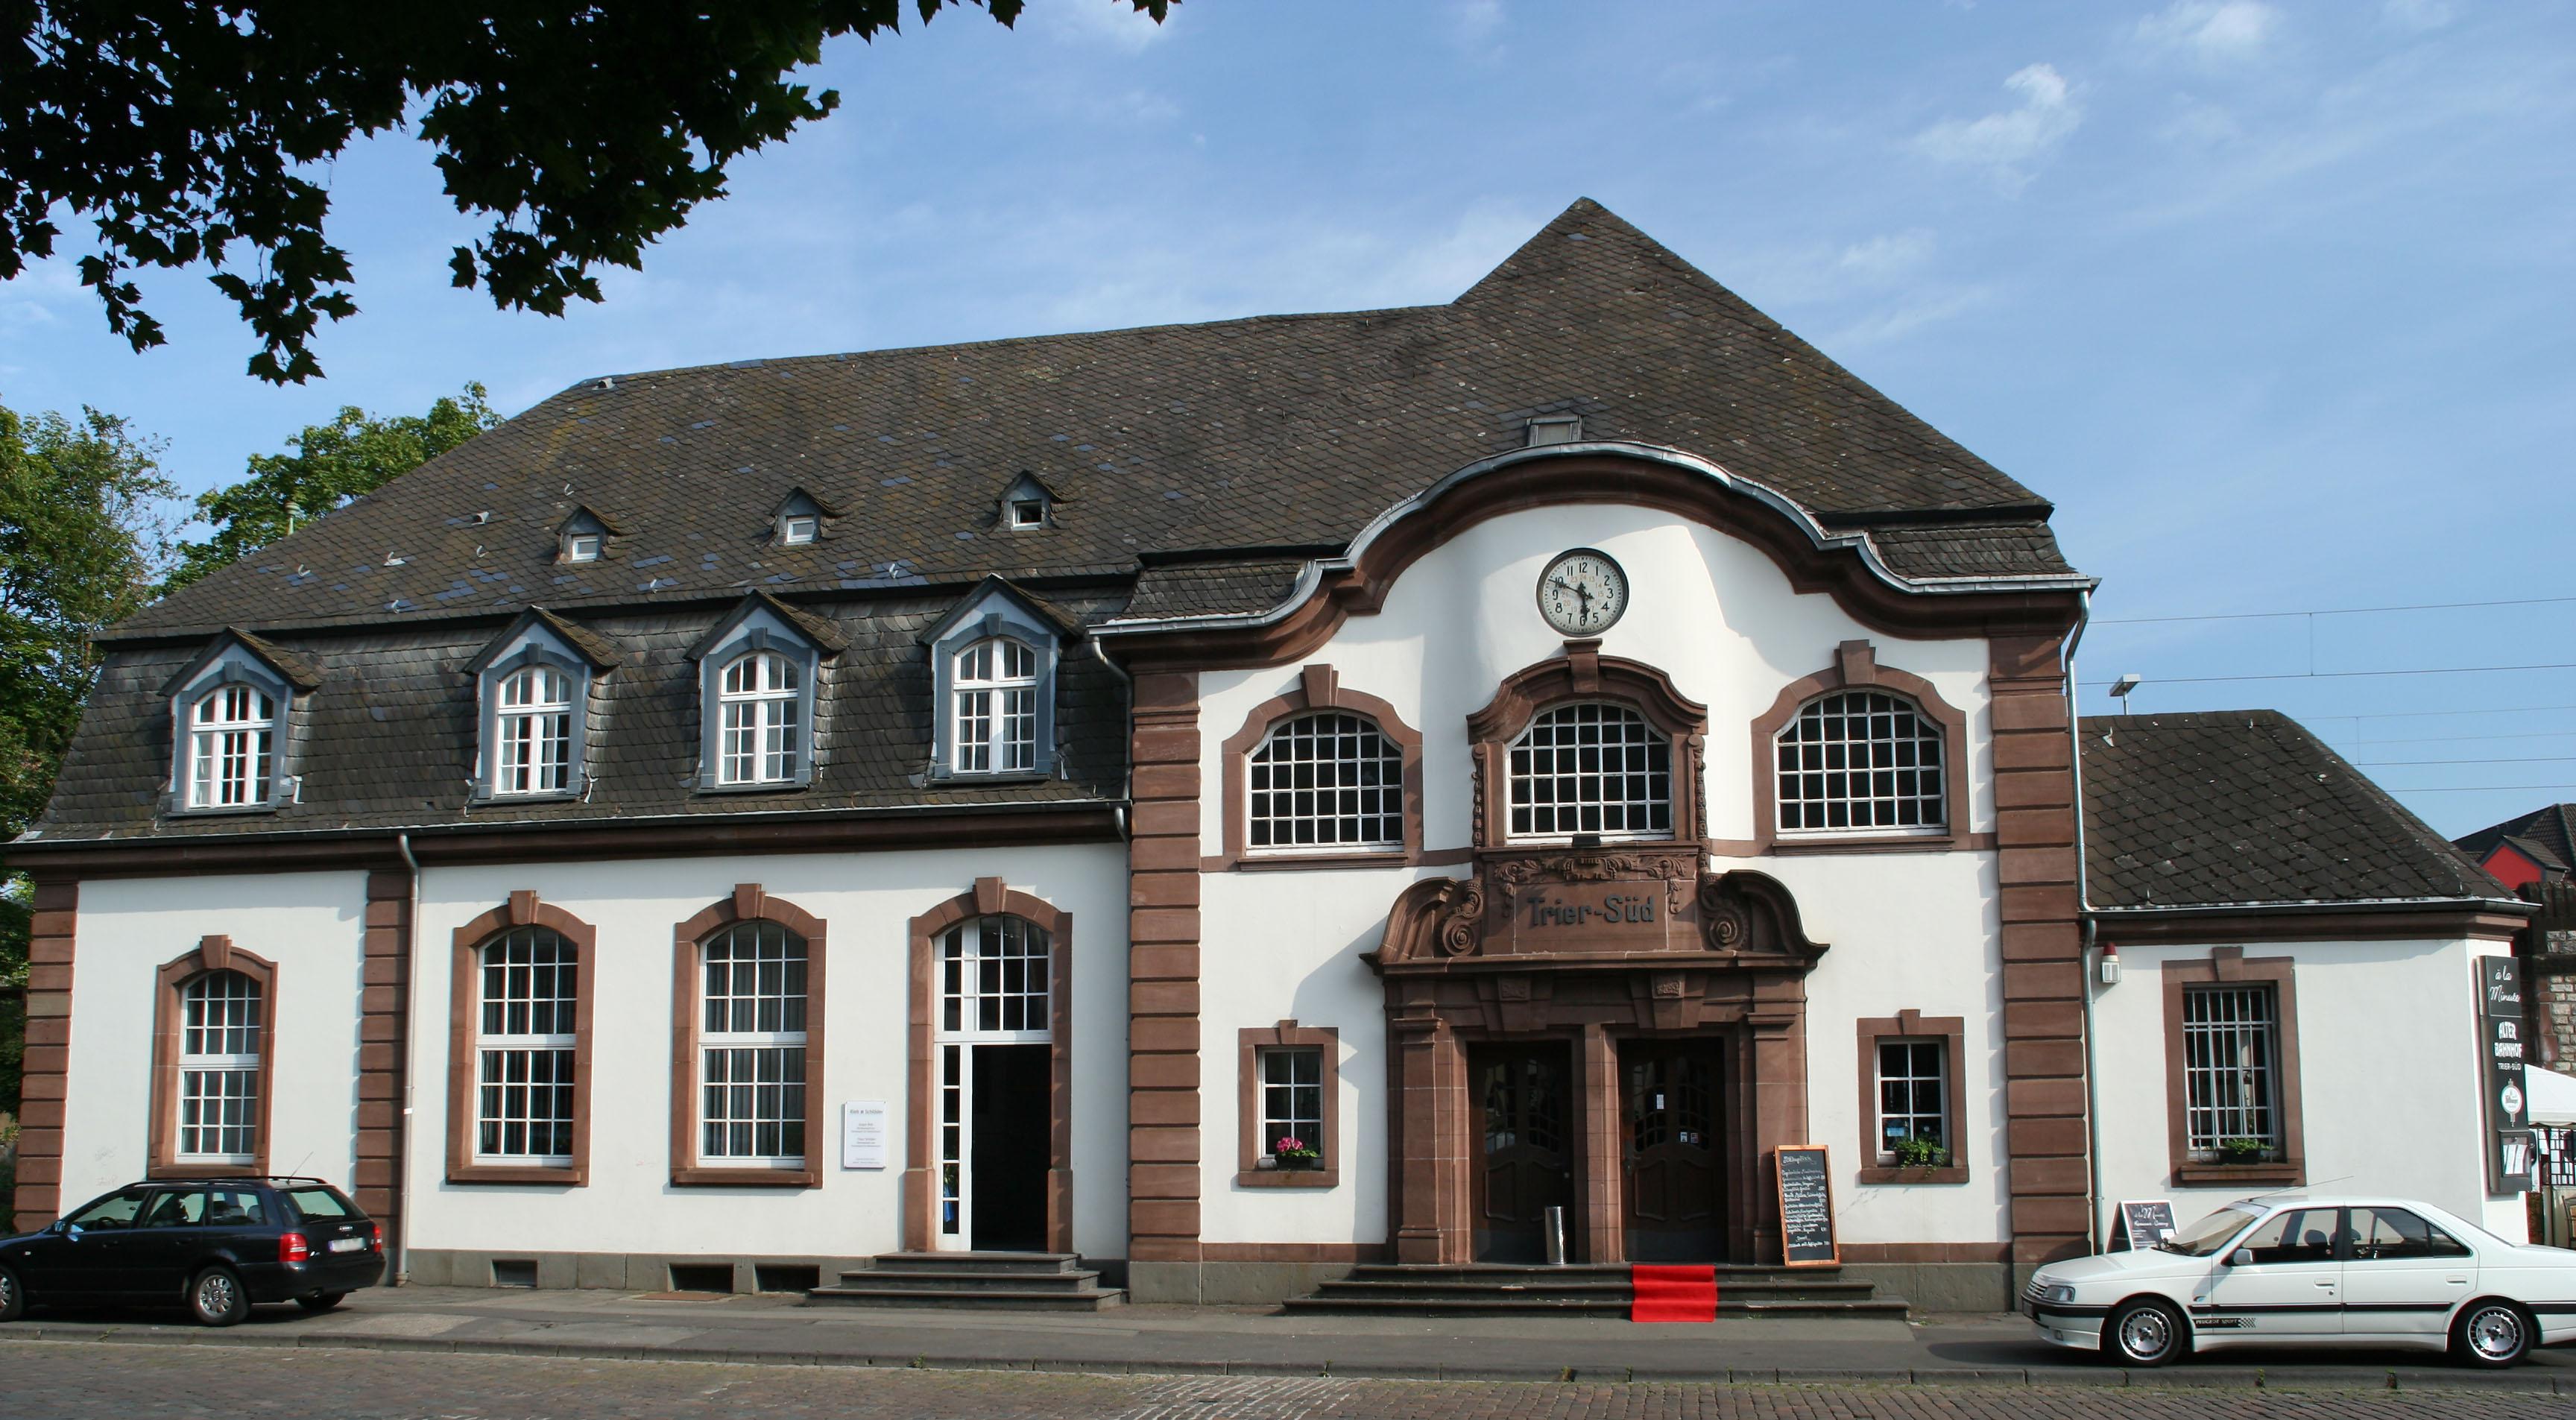 Datei rheinland pfalz trier leoplatz 1 bahnhof trier s wikipedia - Architekt trier ...